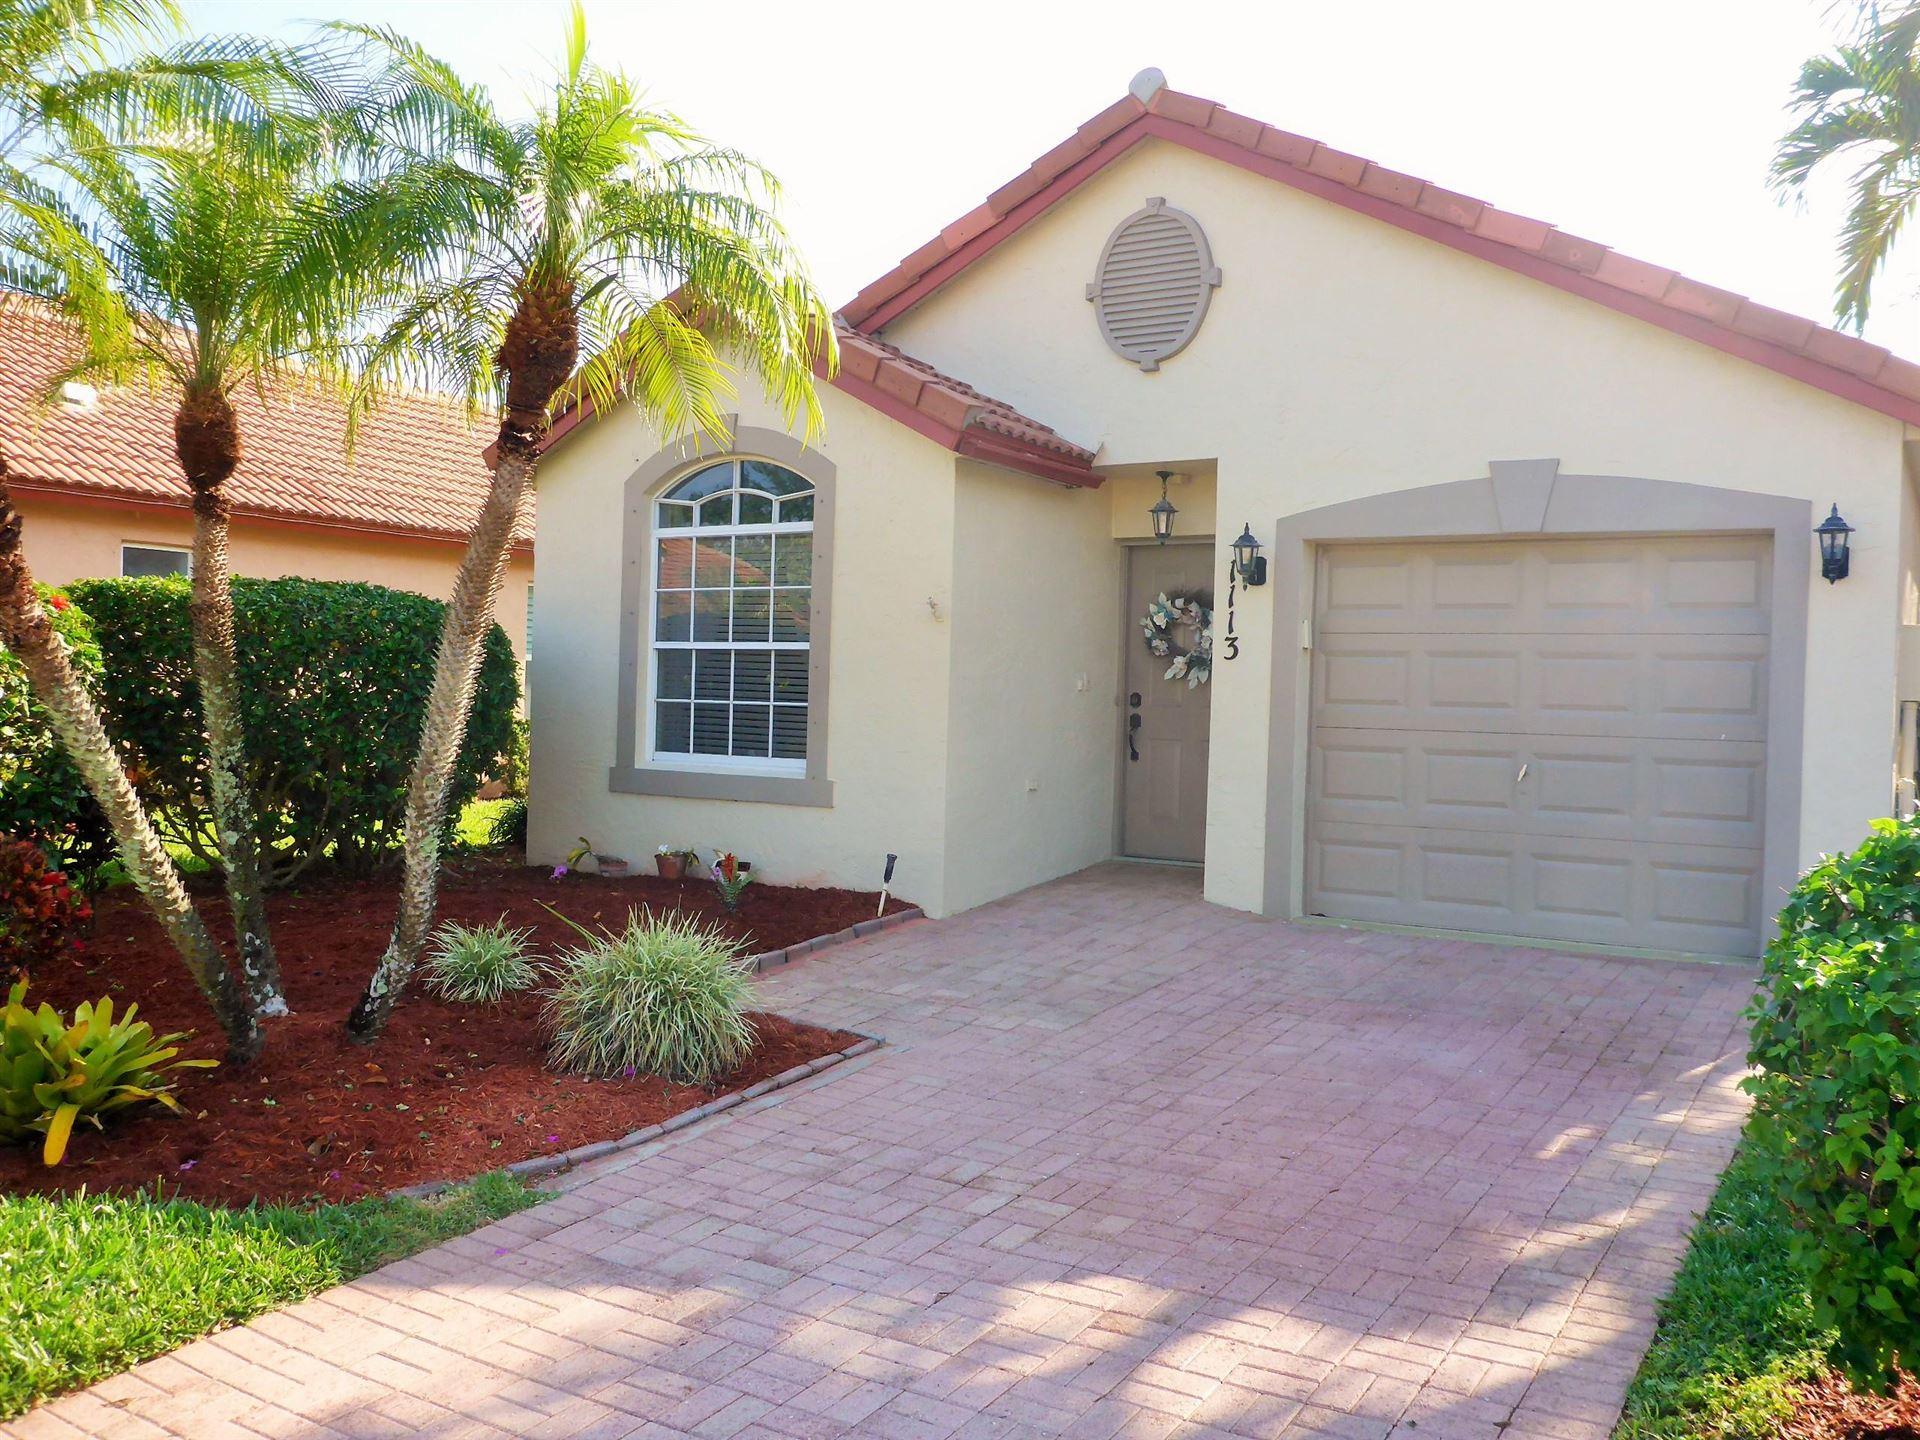 1113 Via Jardin, Riviera Beach, FL 33418 - #: RX-10612731